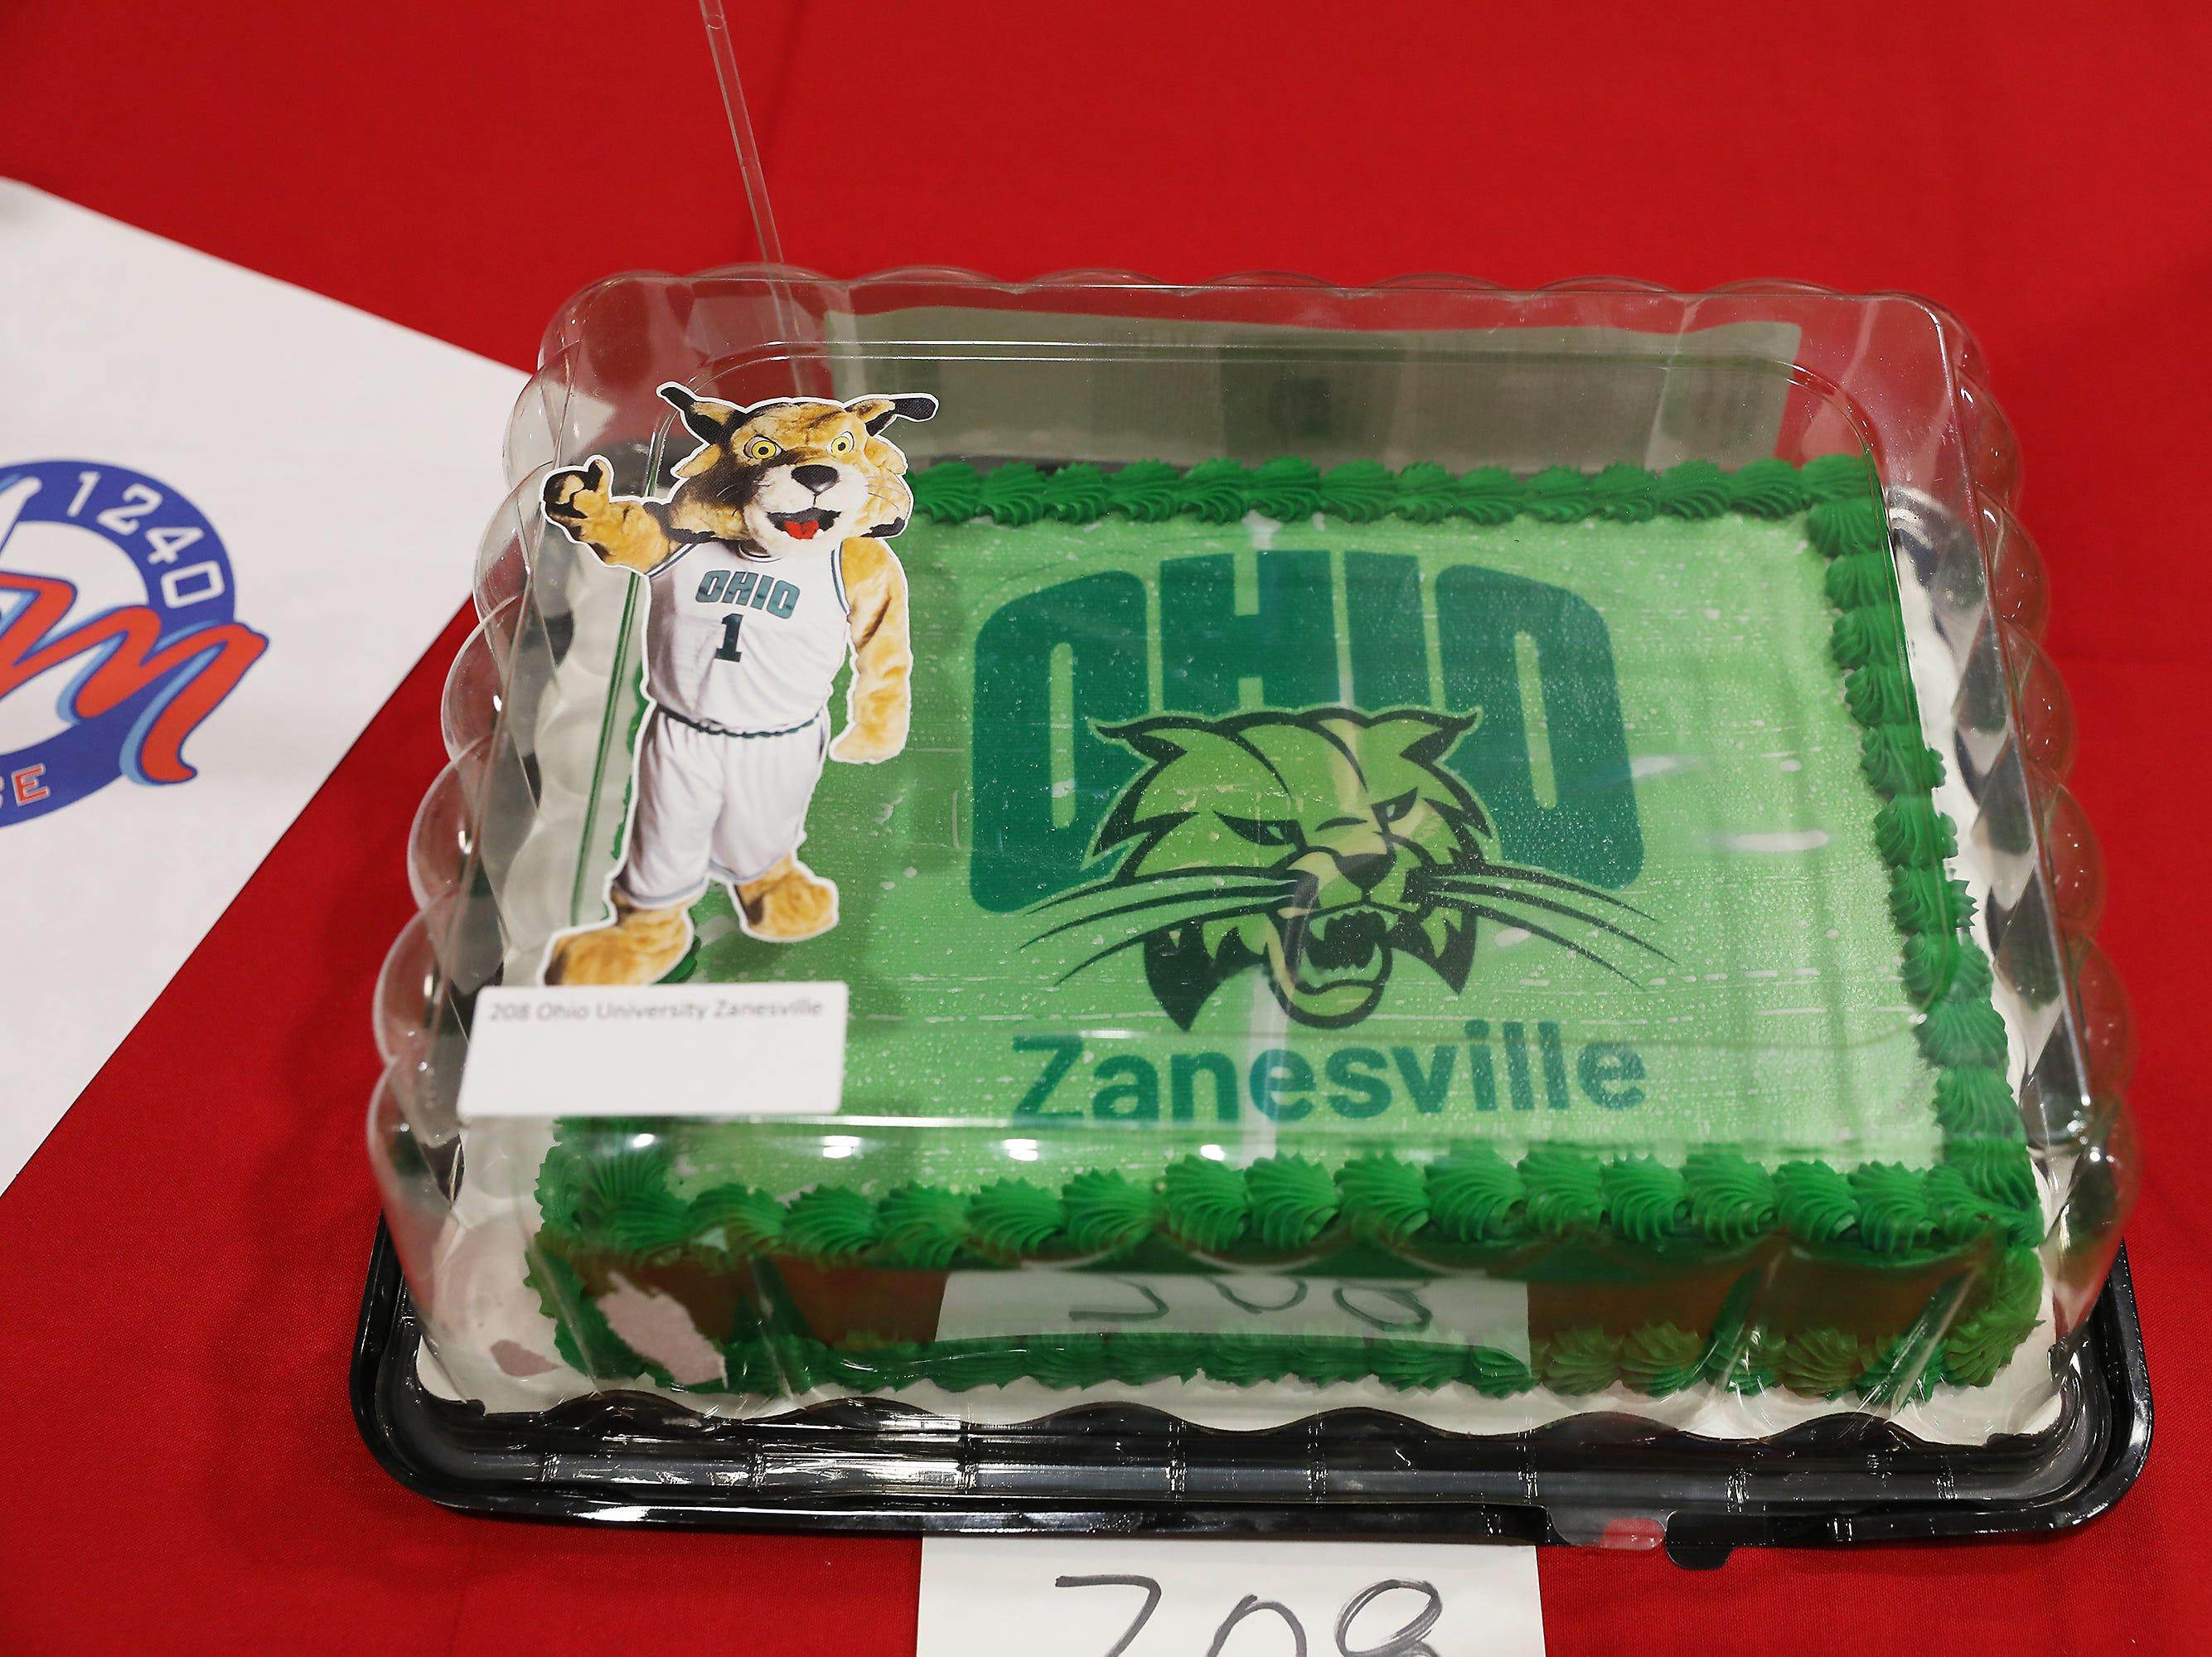 5:45 P.M. Thursday cake 208 Ohio University Zanesville - $500 for tuition